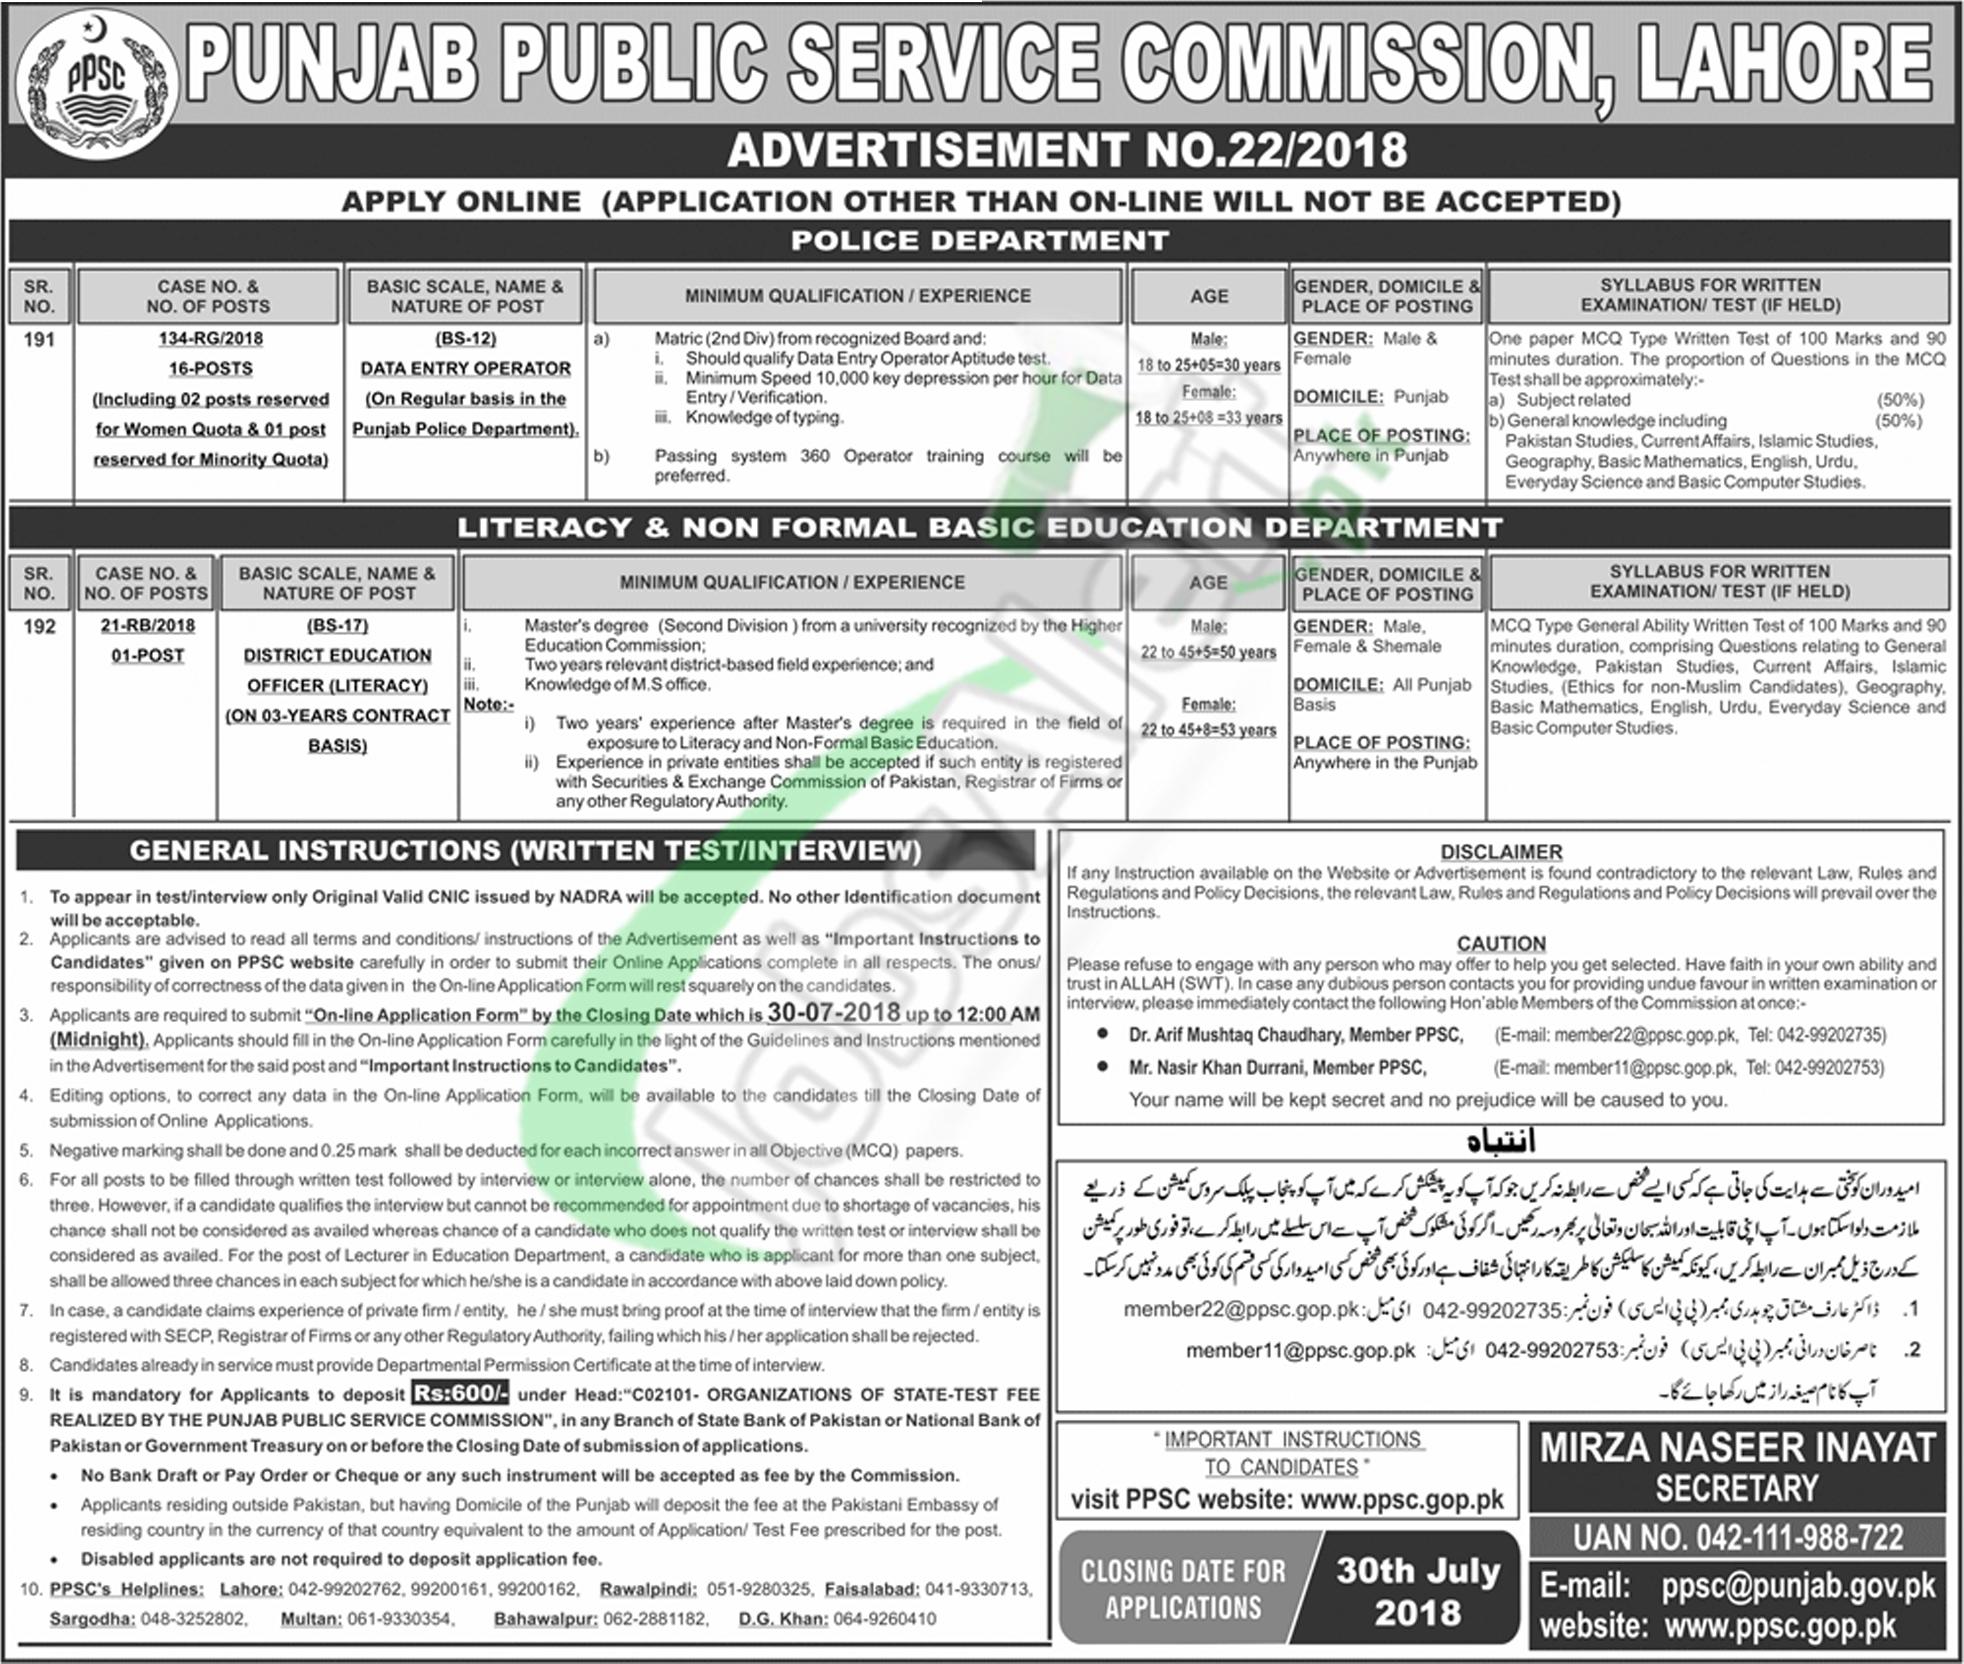 Ppsc Data Entry Operator Jobs 2018 Punjab Police Vacancies Apply